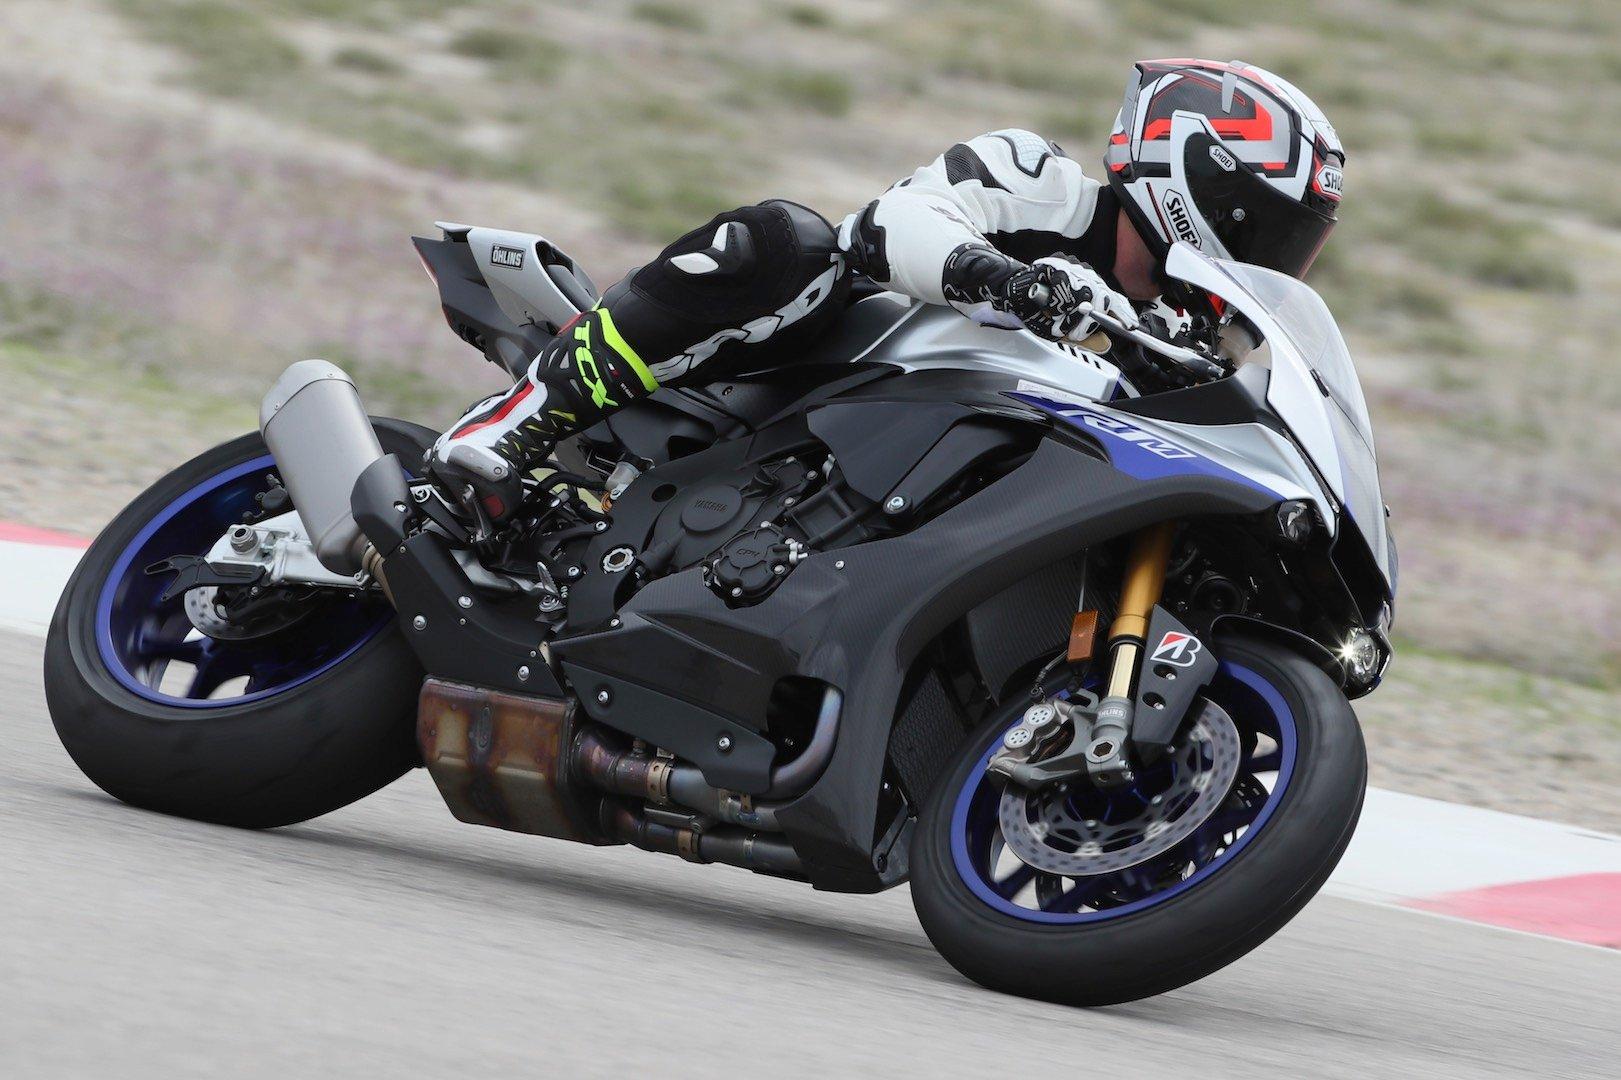 Bridgestone Battlax Racing R11 Tire Review: Track-Ready DOT